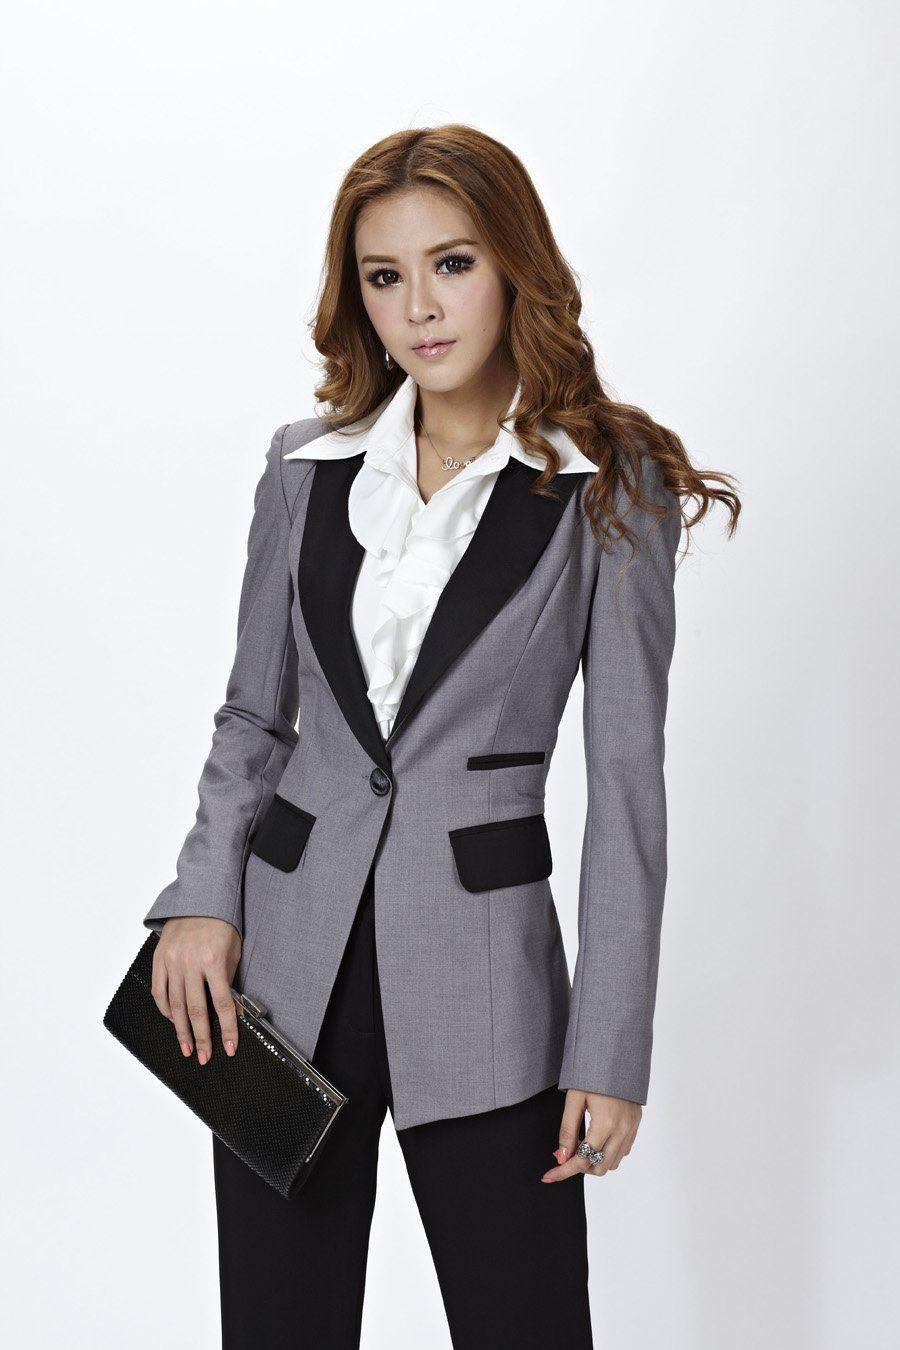 Ladies Pant Suits | 2013 New Women Suits Blazer U0026 Pants For OL Office Ladies Professional ...